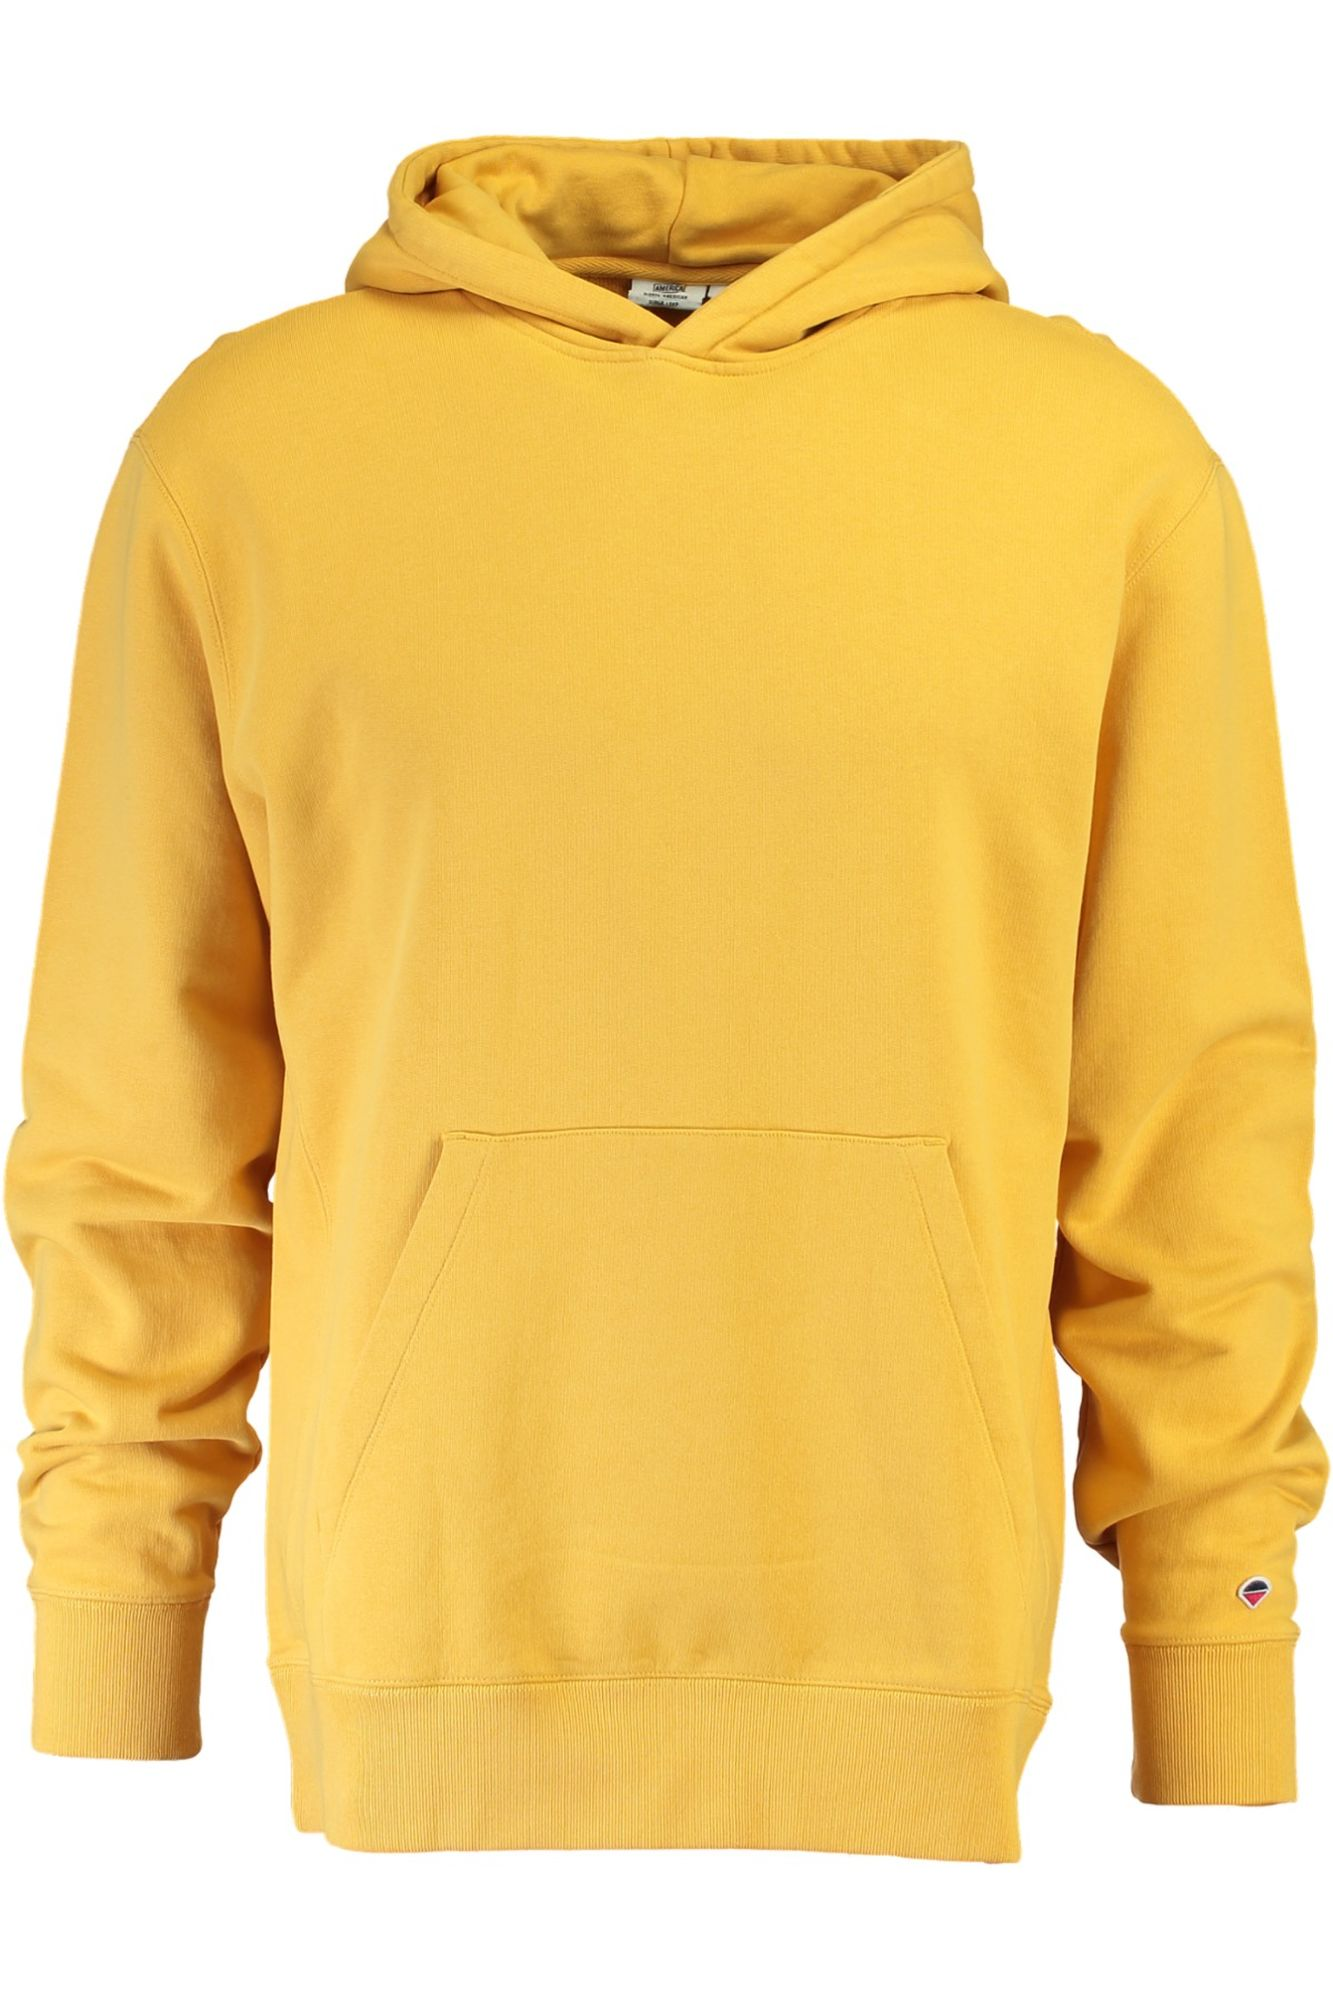 Men Hoodie Sagar Yellow Buy Online.